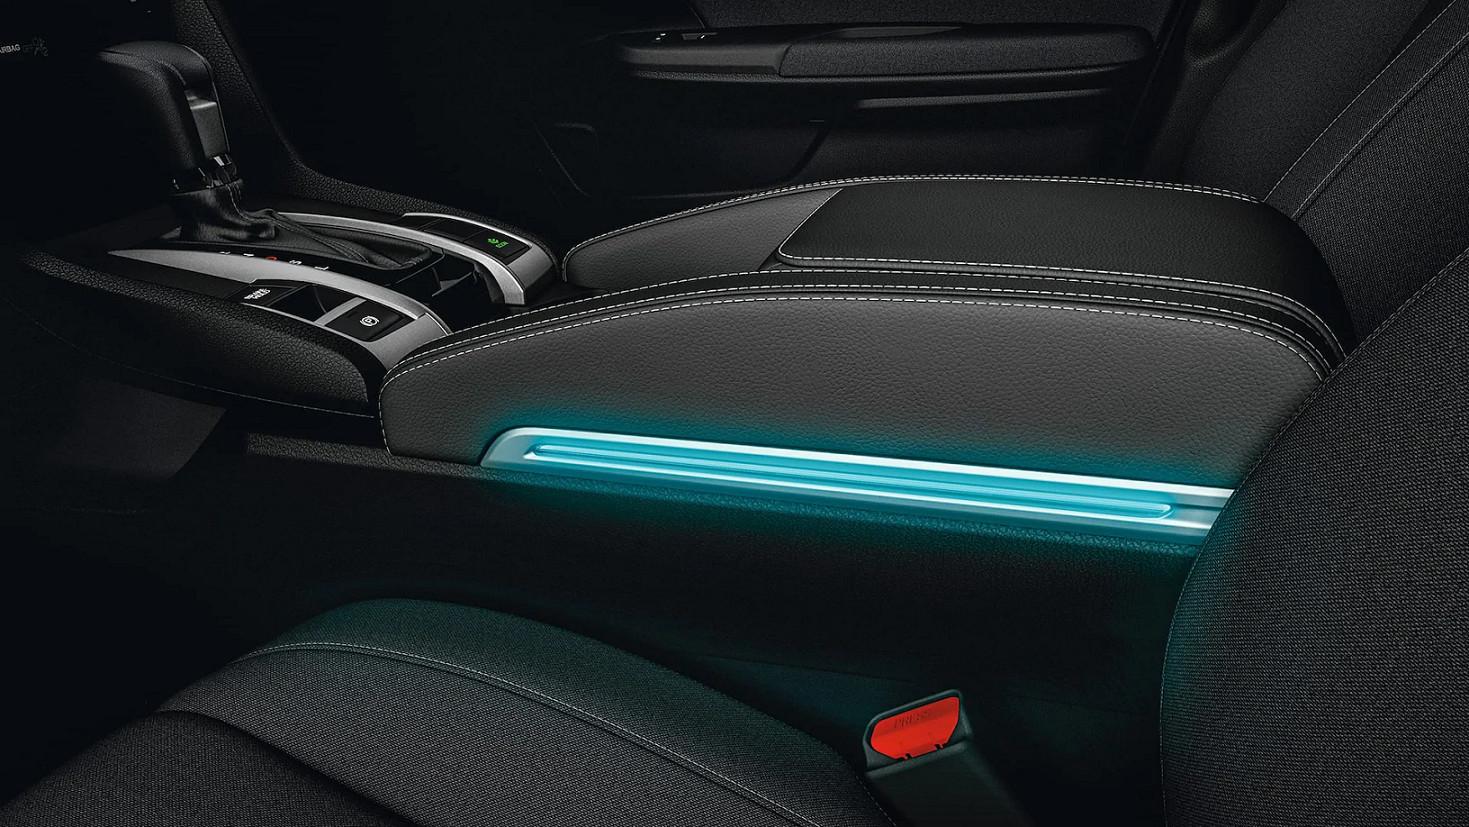 Eye-Catching Cabin of the 2020 Honda Civic